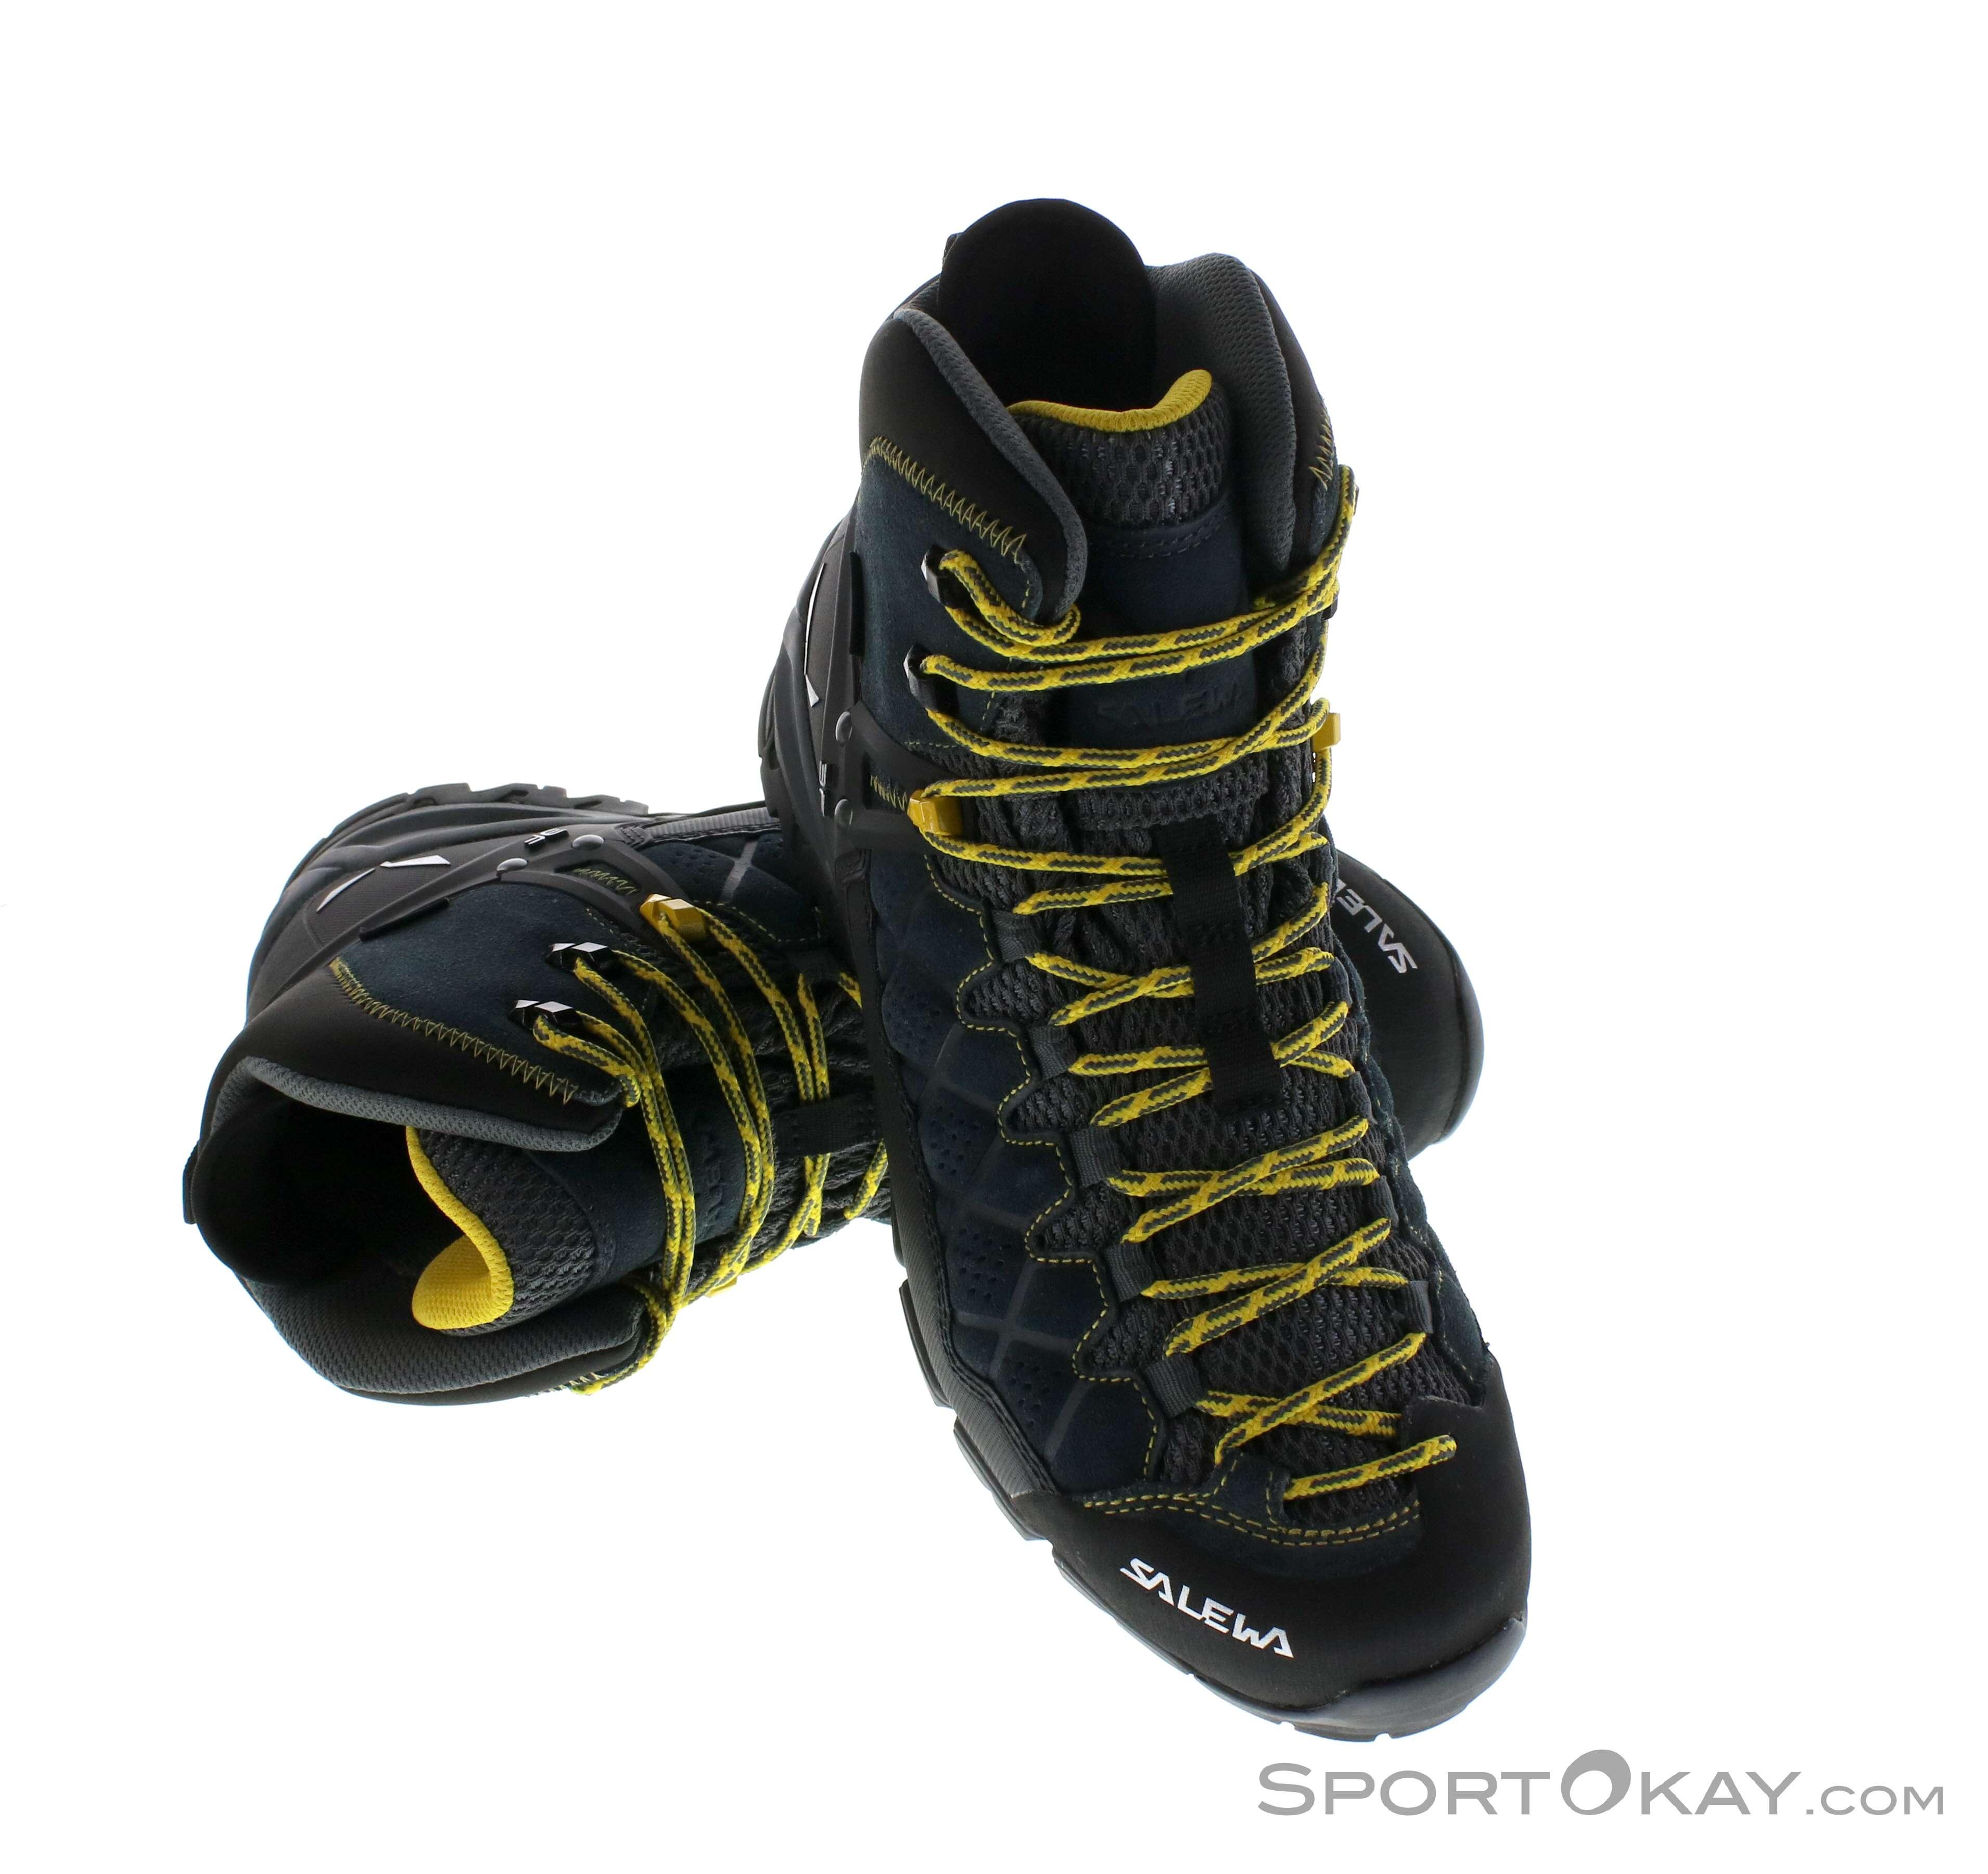 715d6e7faec82 Salewa Alp Trainer GTX Uomo Scarpe da Trekking Gore-Tex - Scarpe da ...